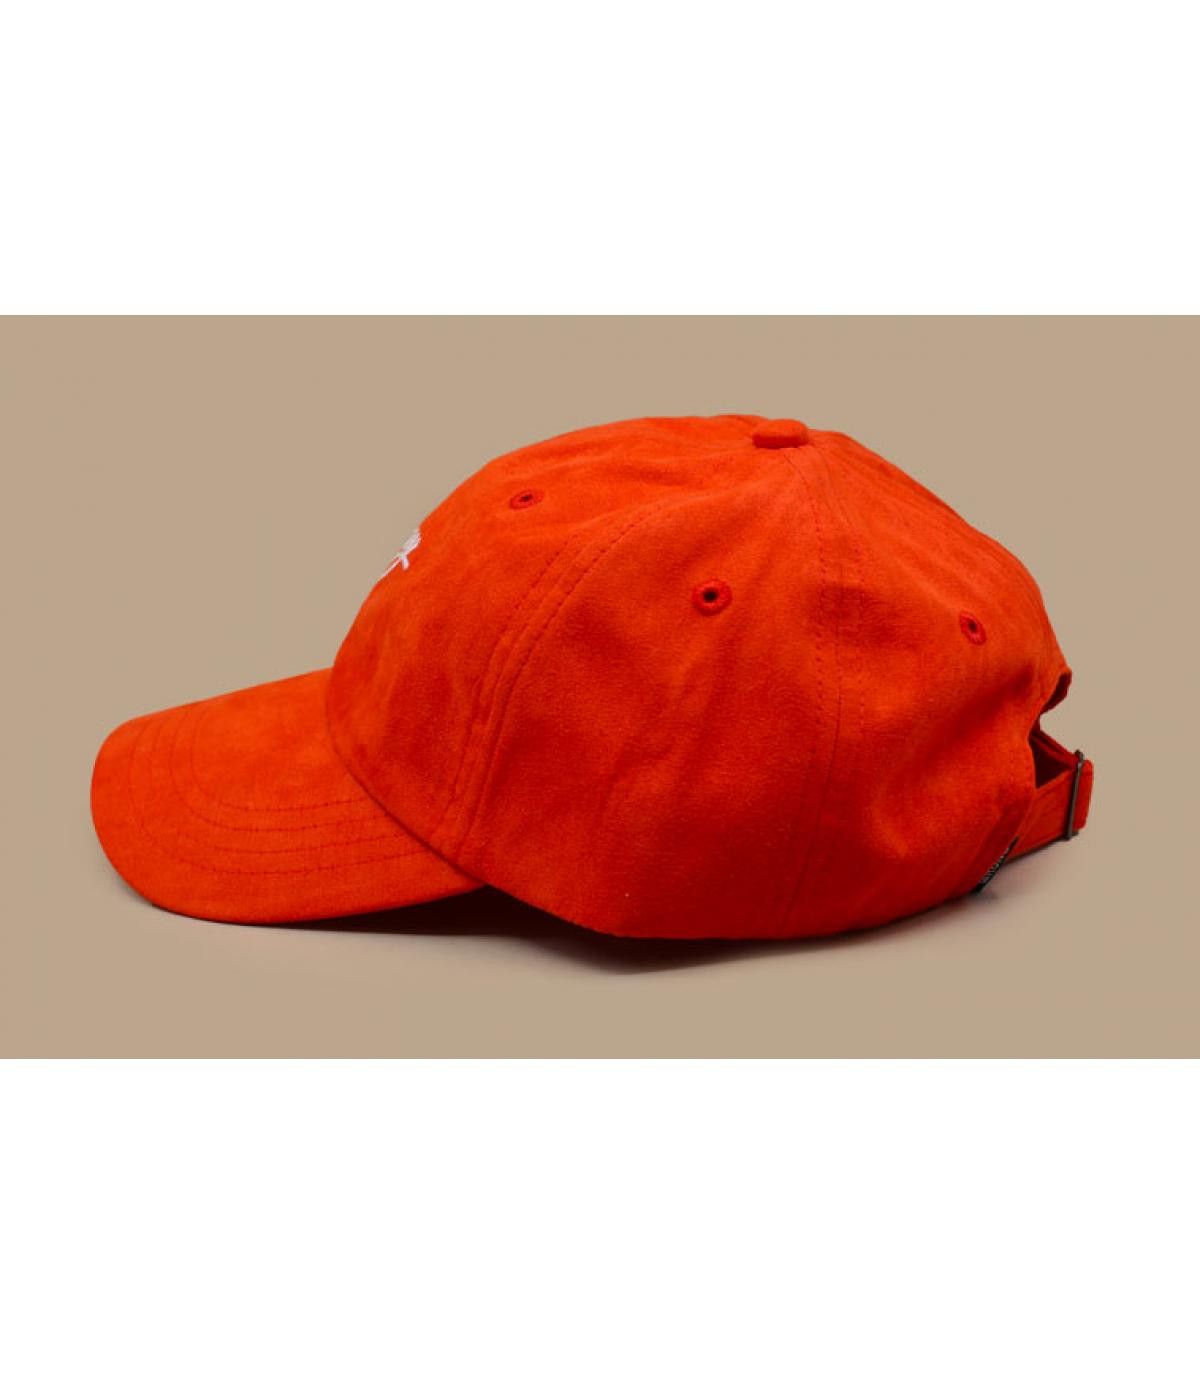 Details Sign Ball orange - Abbildung 5